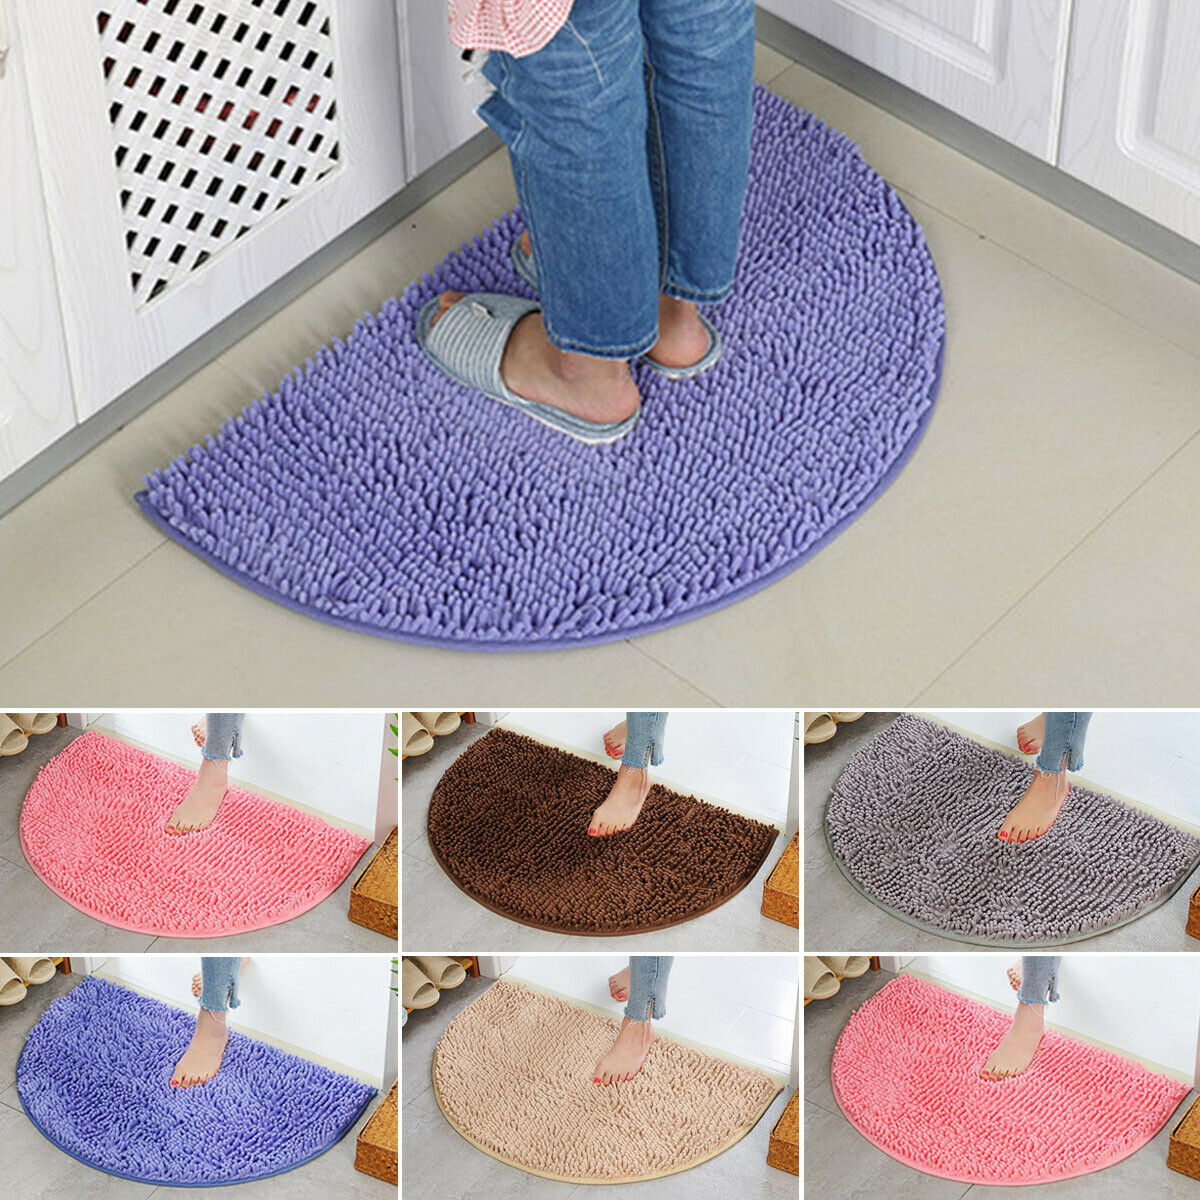 Nueva media luna ronda Semi círculo lavable a máquina de goma alfombra, tapete de baño